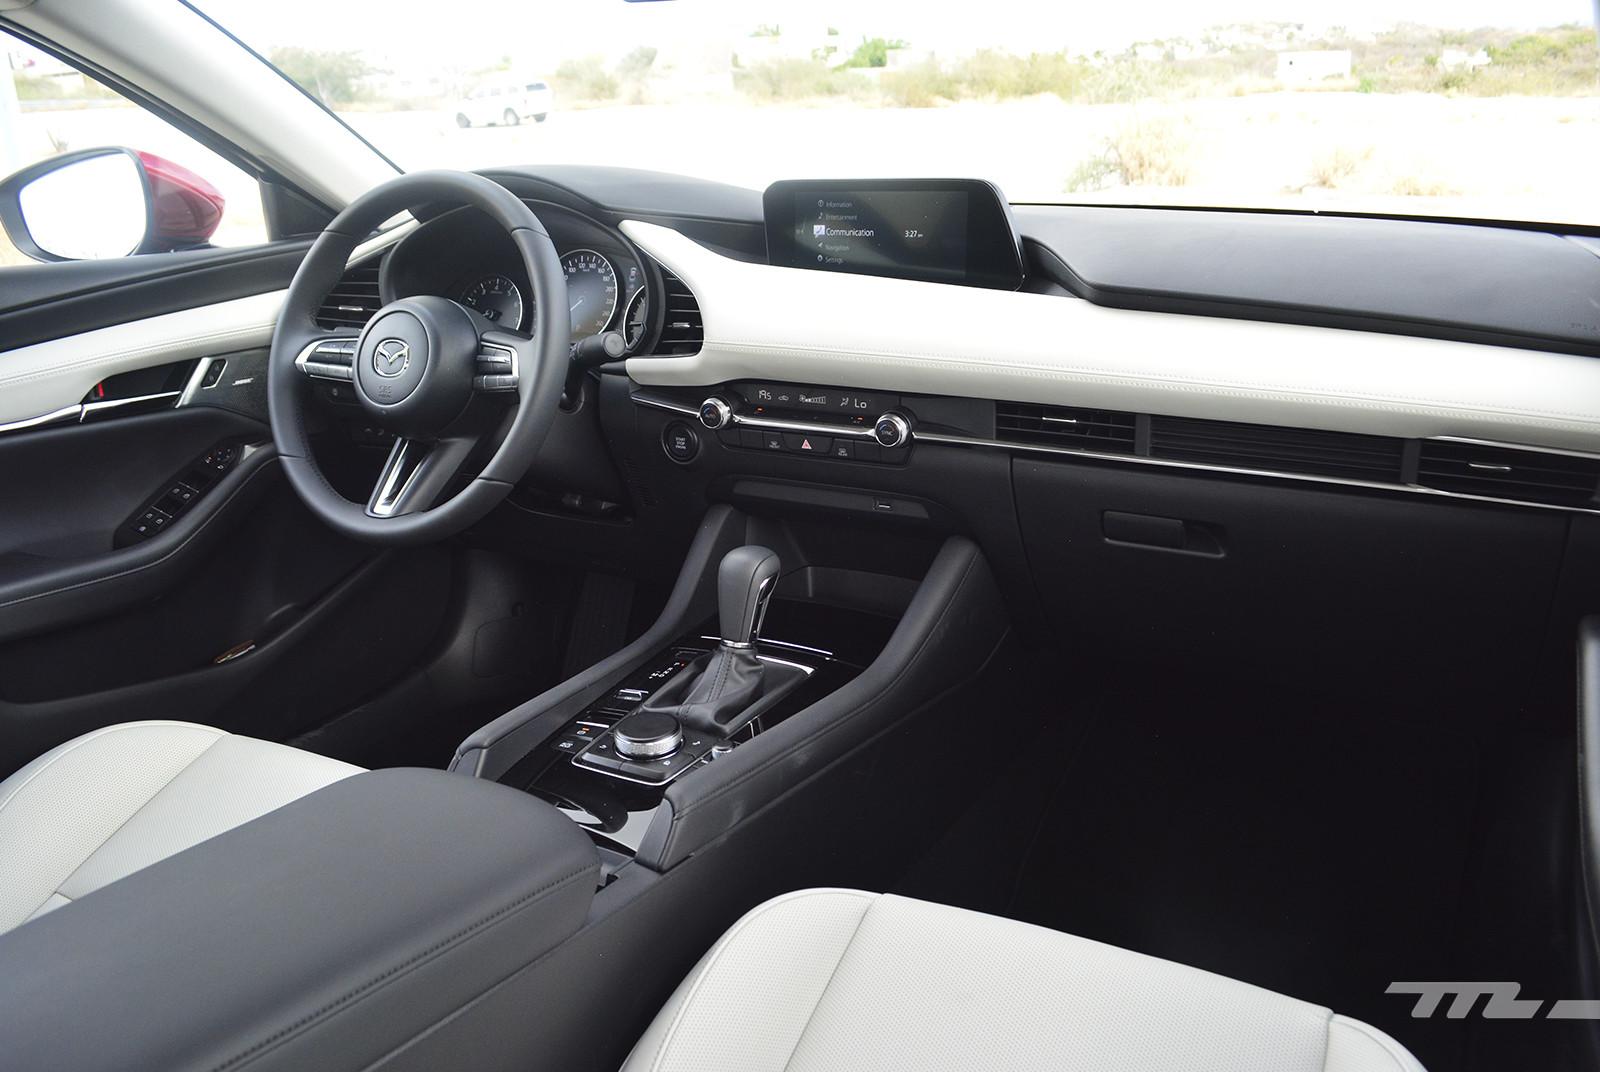 Foto de Mazda 3 vs. SEAT León (comparativa) (15/28)